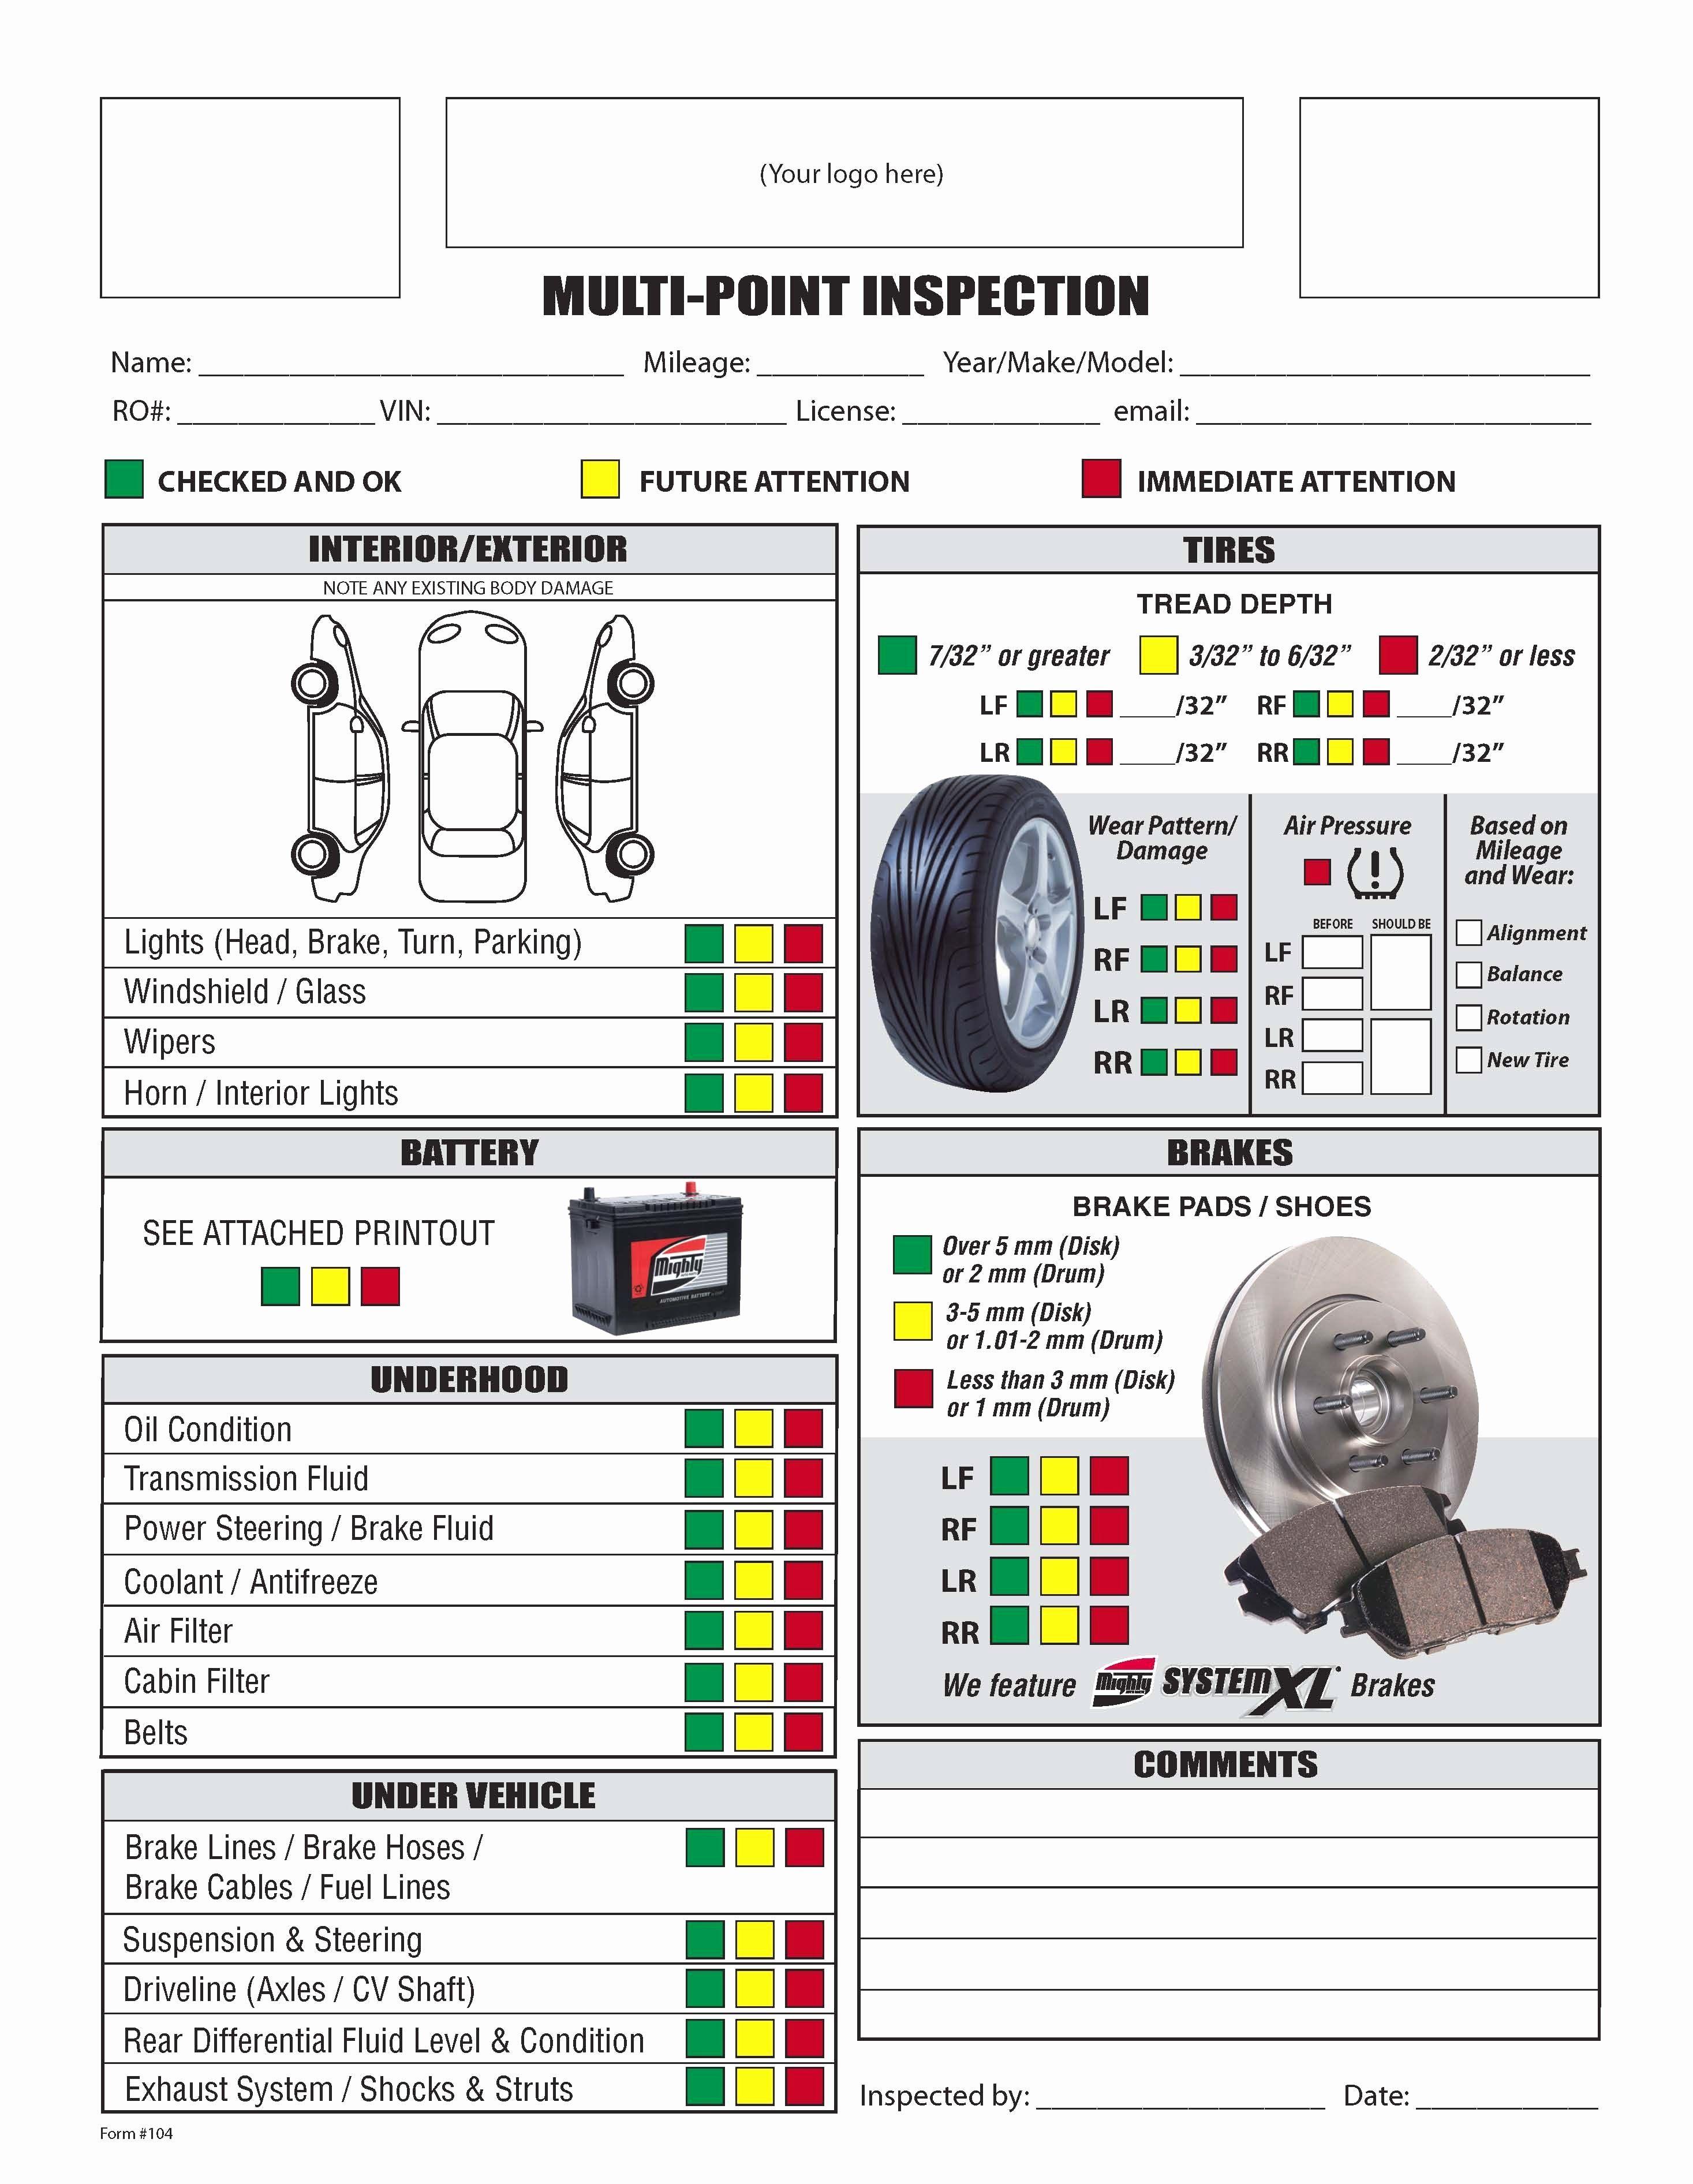 Auto Repair Checklist Template Elegant Image Result For Vehicle Parts Checklist Vehicle Inspection Auto Repair Car Mechanics Garage Free vehicle inspection form template